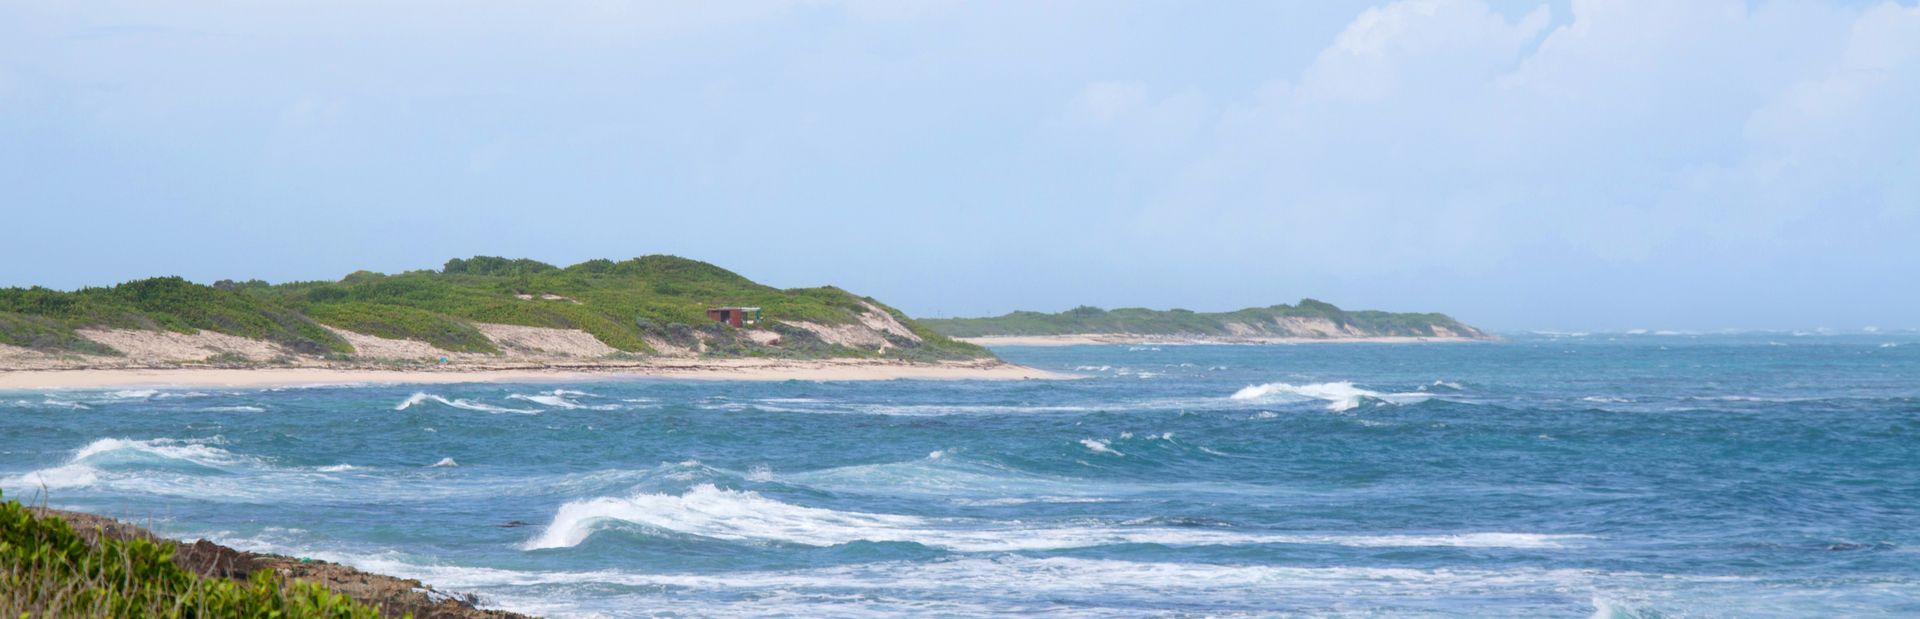 Barbuda charter itineraries